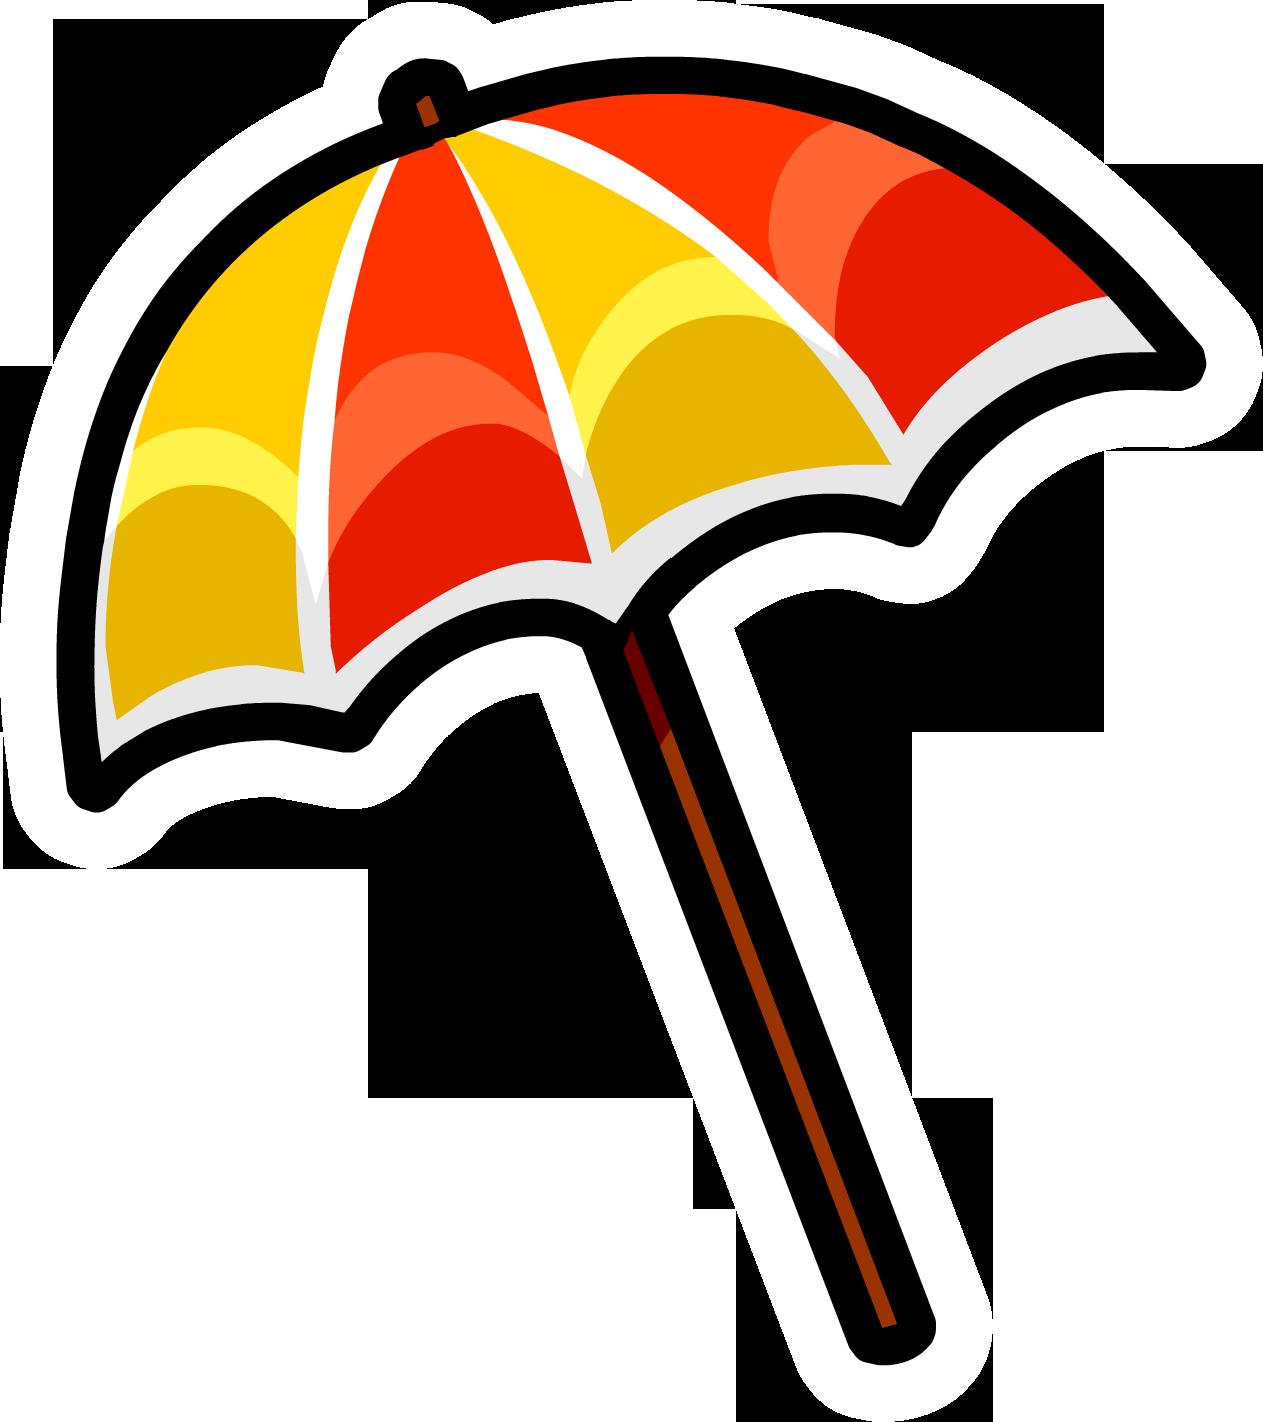 Beach Umbrella Images - Cliparts.co